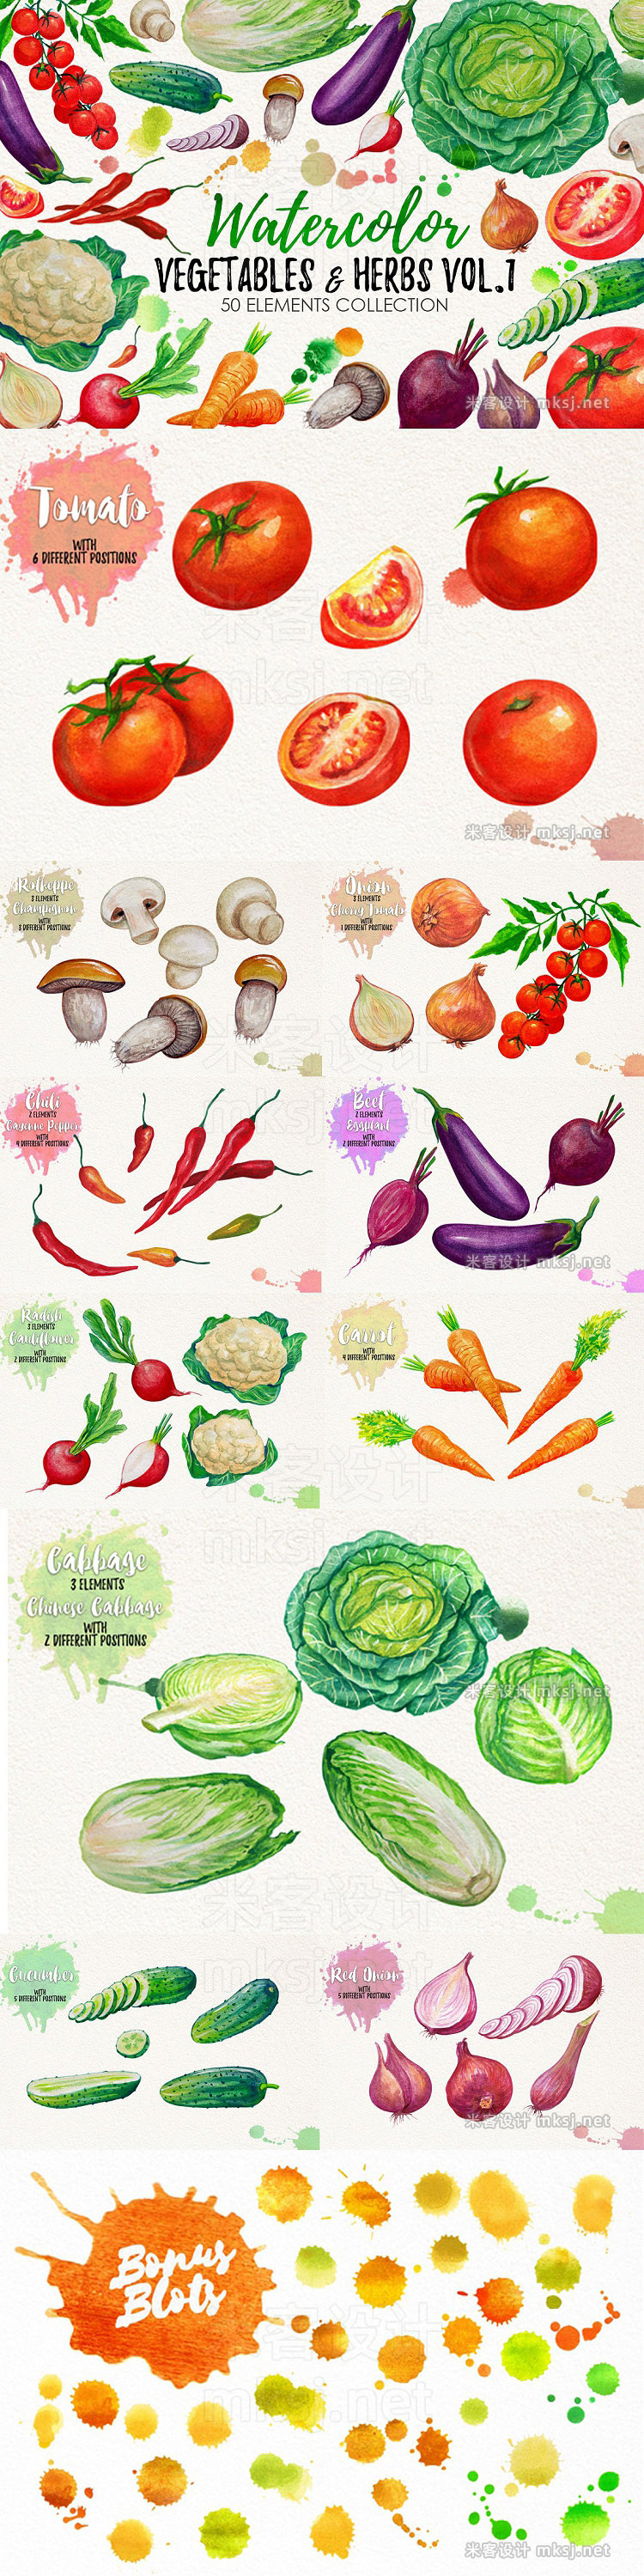 png素材 Watercolor Big Food Bundle